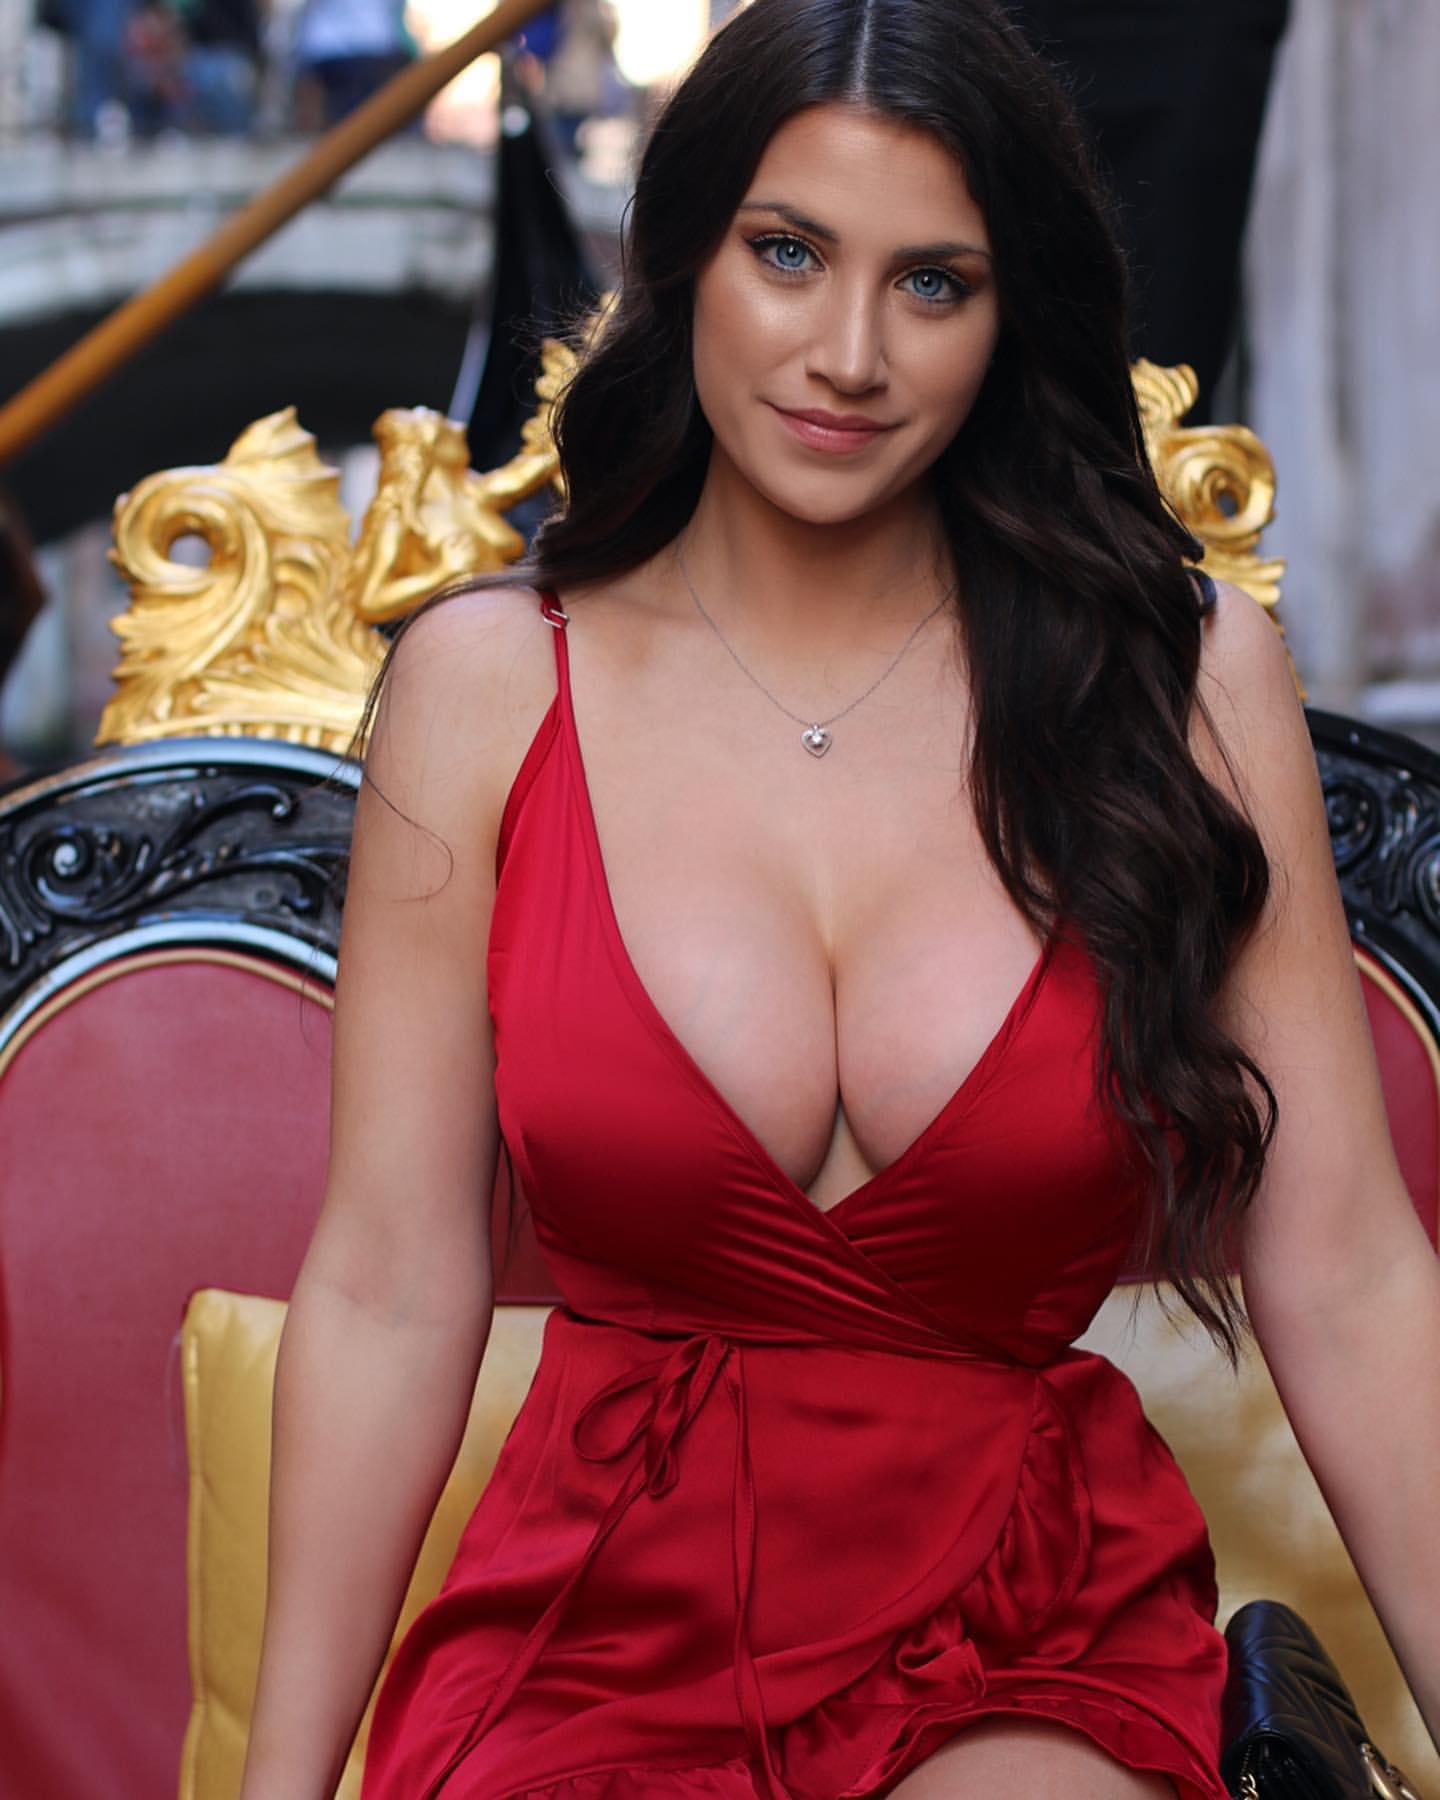 Salma hayek serves up killer cleavage in smoking hot throwback, fans go wild